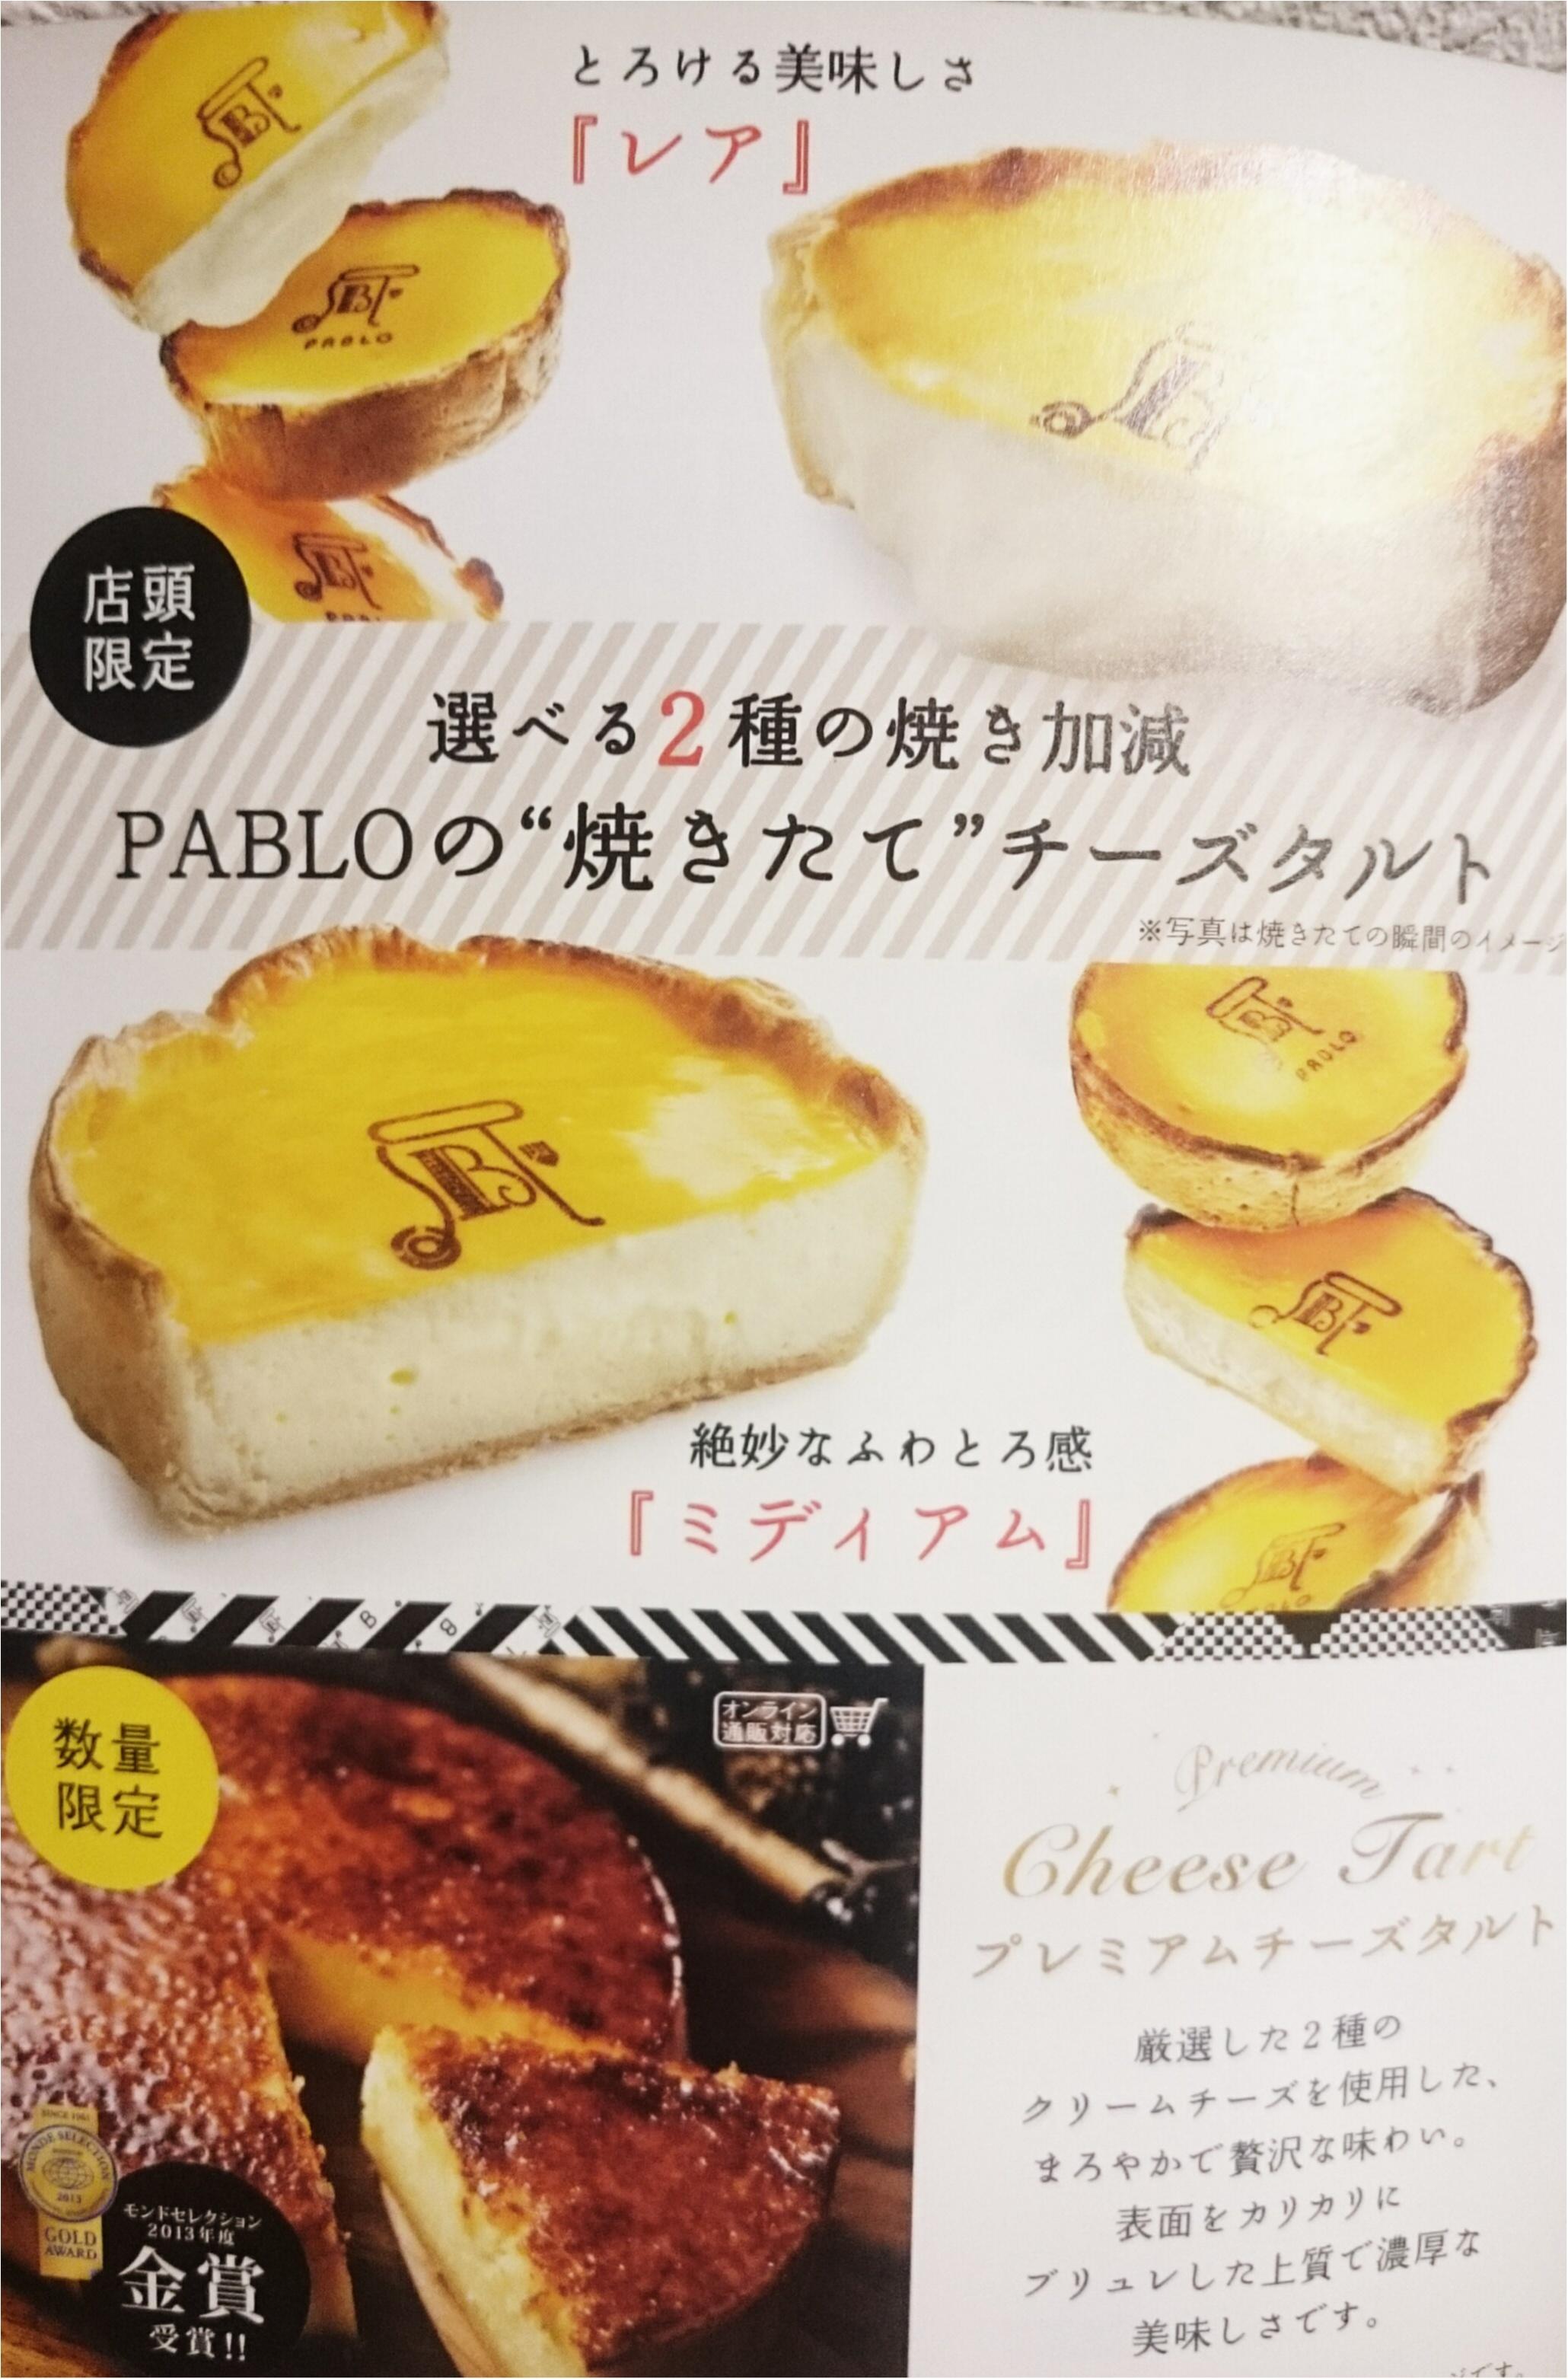 ☆PABLOのminiタルトを全種類食べてみました☆_21